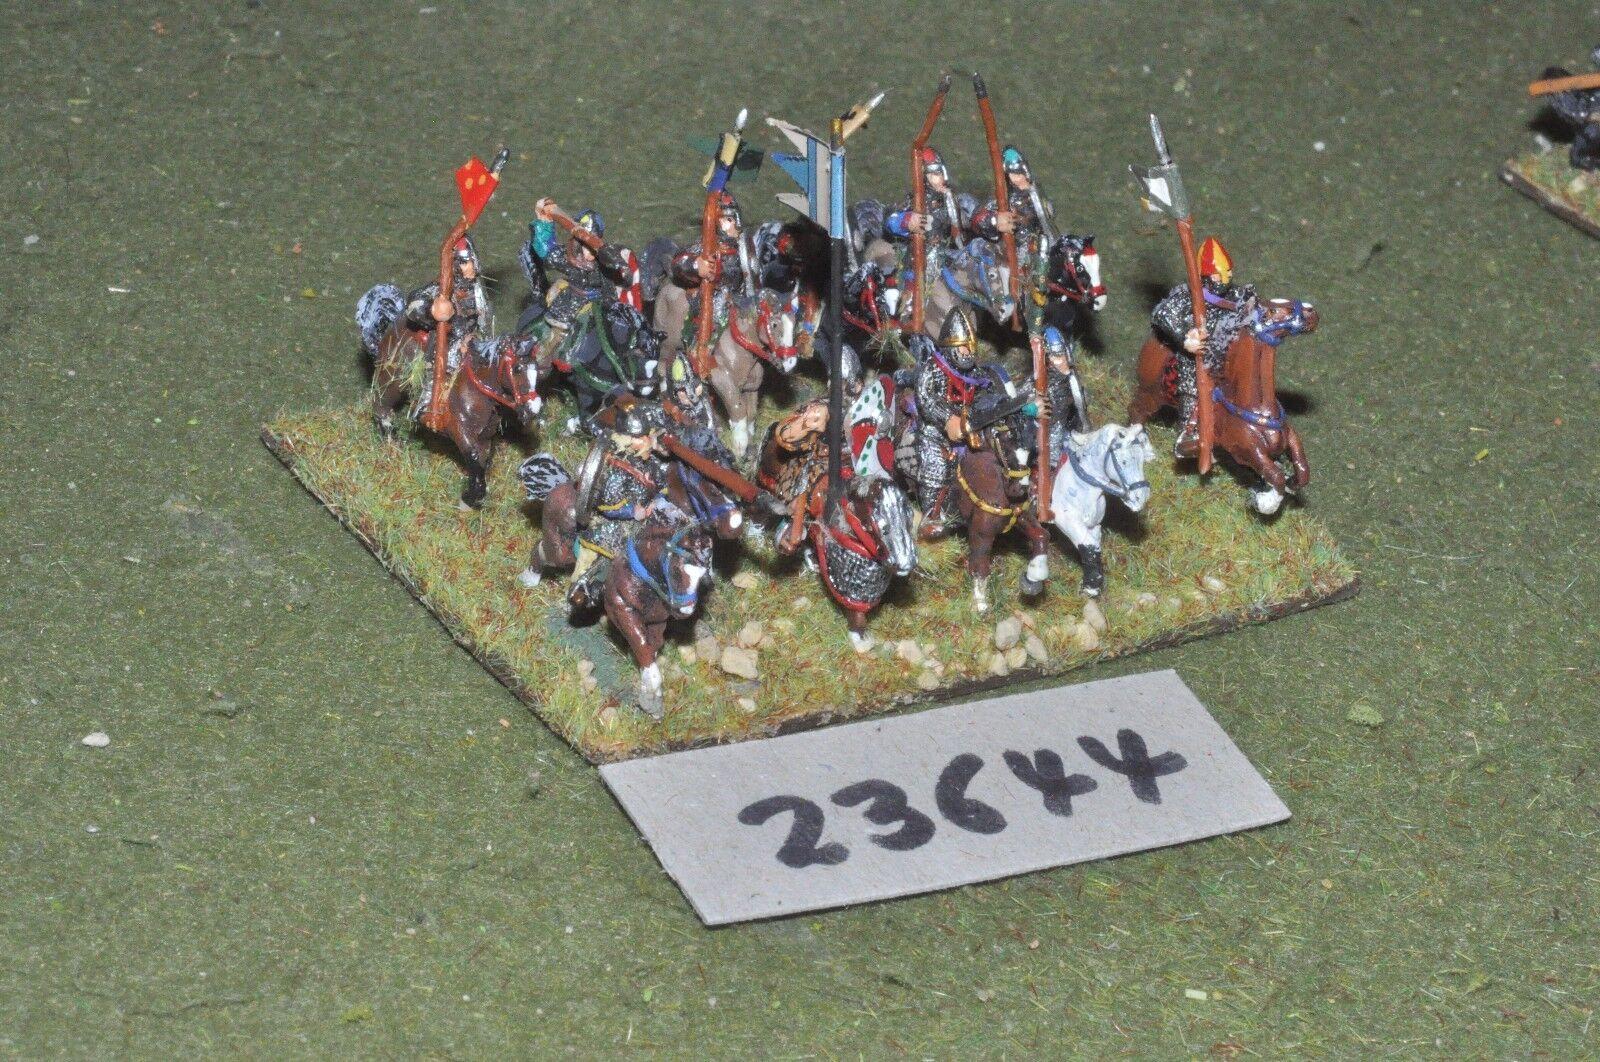 15mm dark ages   norman - milites 12 figures - cav (23644)